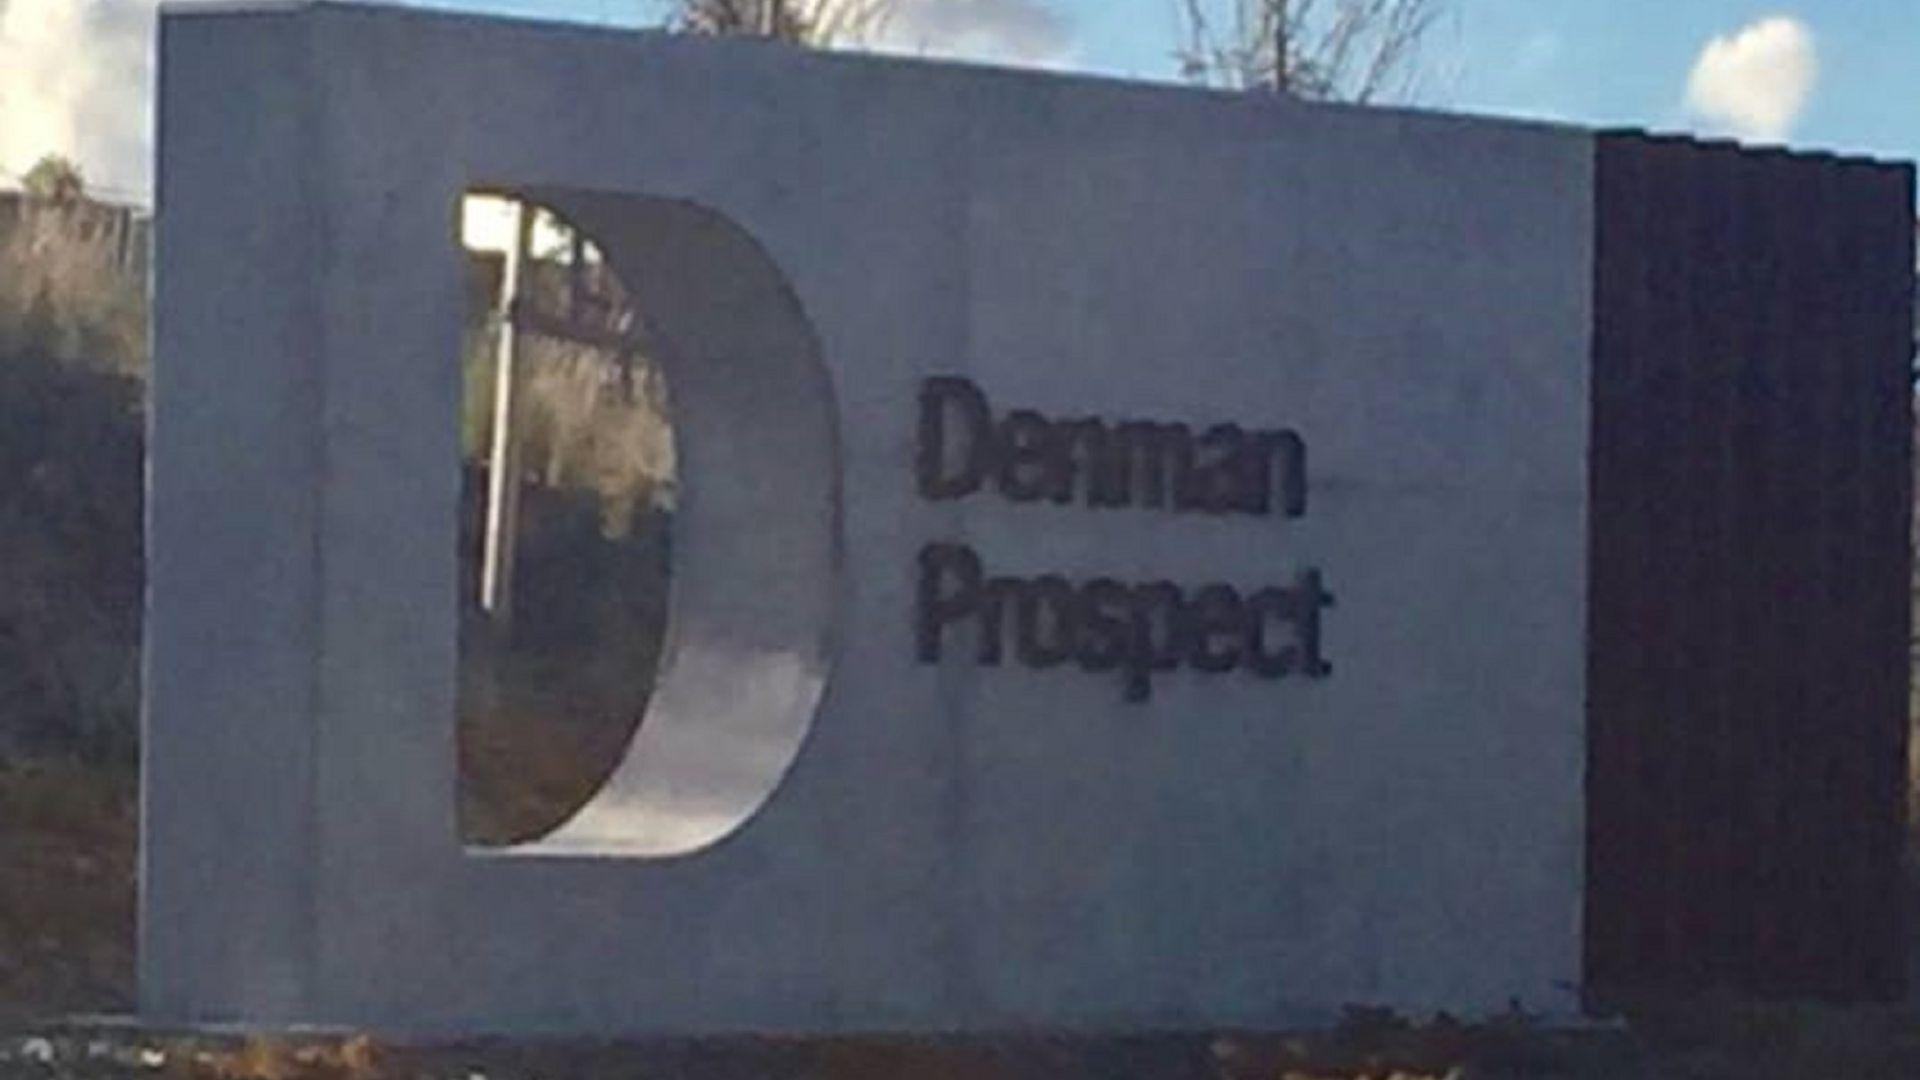 52 Ada Norris Ave, Denman Prospect ACT 2611, Image 2